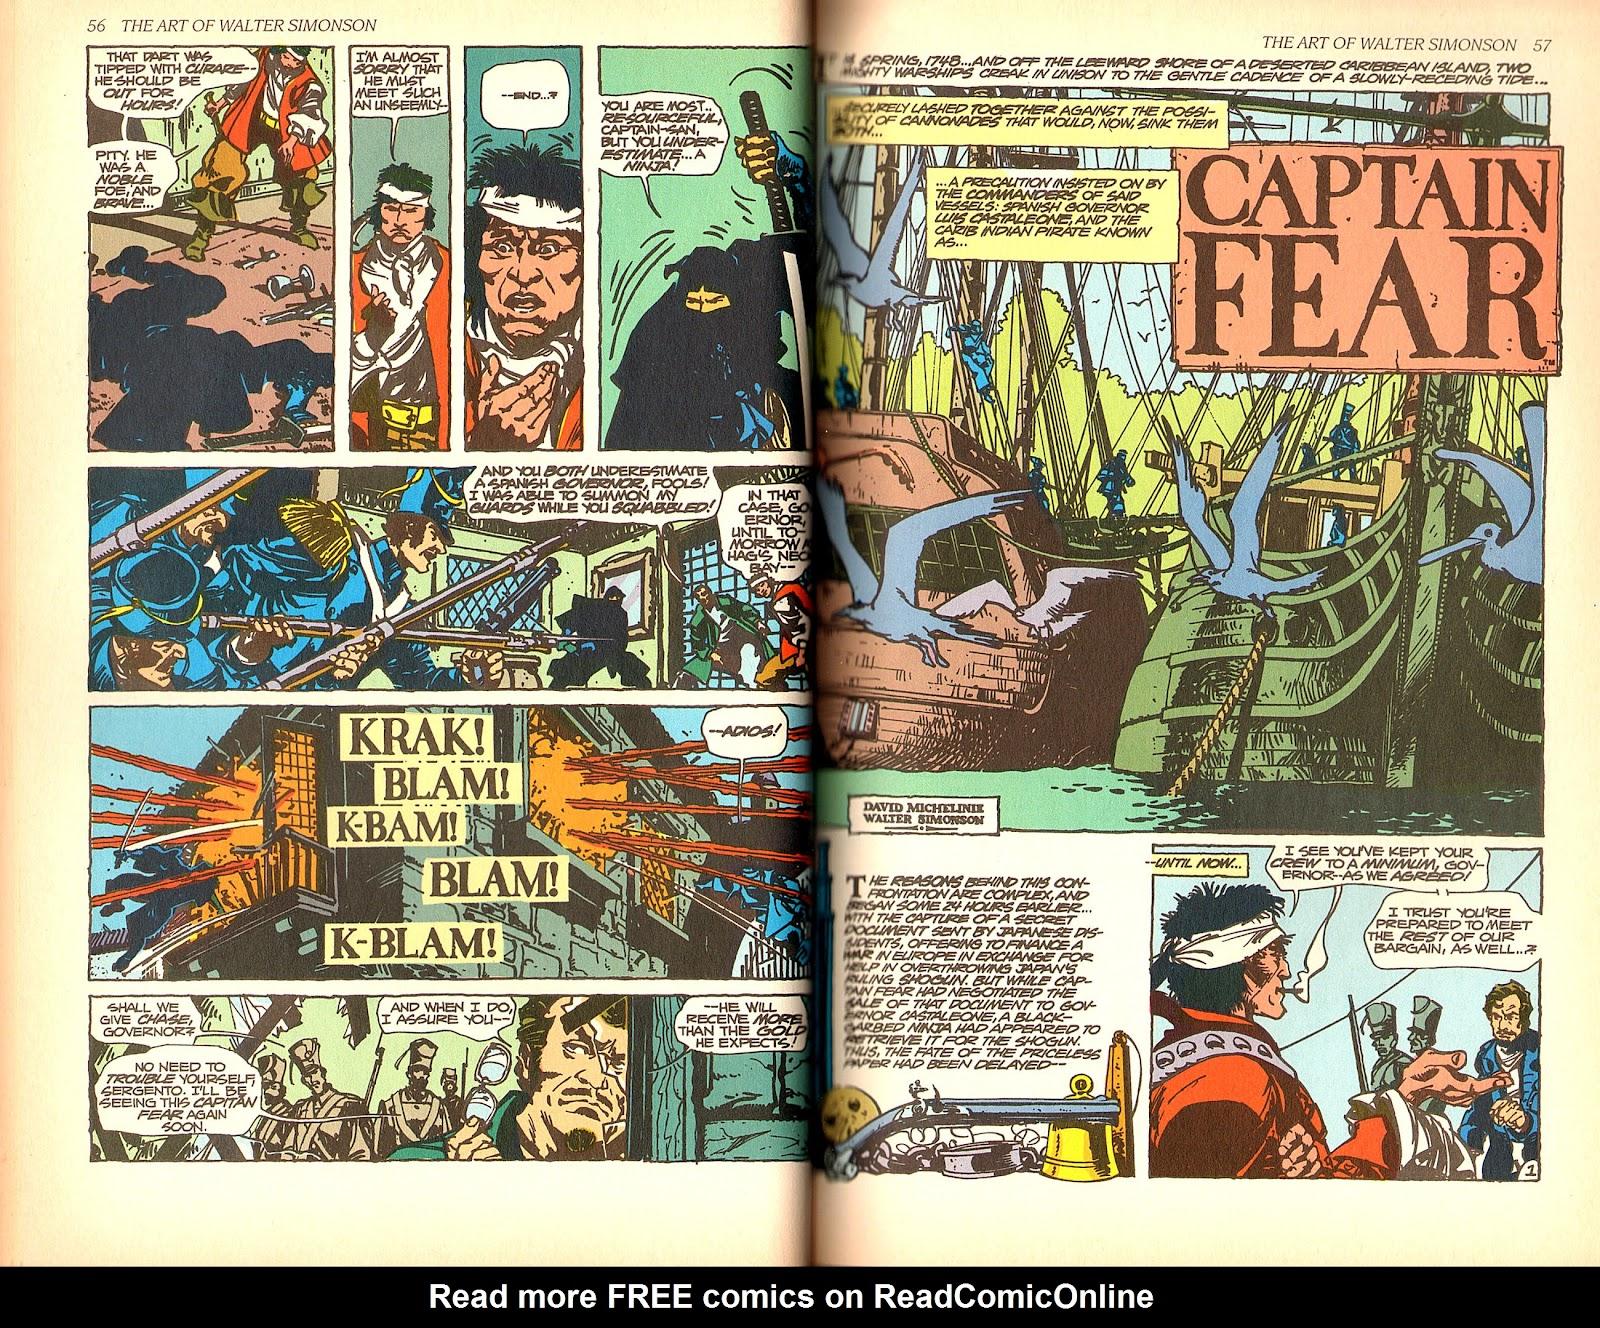 Read online The Art of Walter Simonson comic -  Issue # TPB - 30